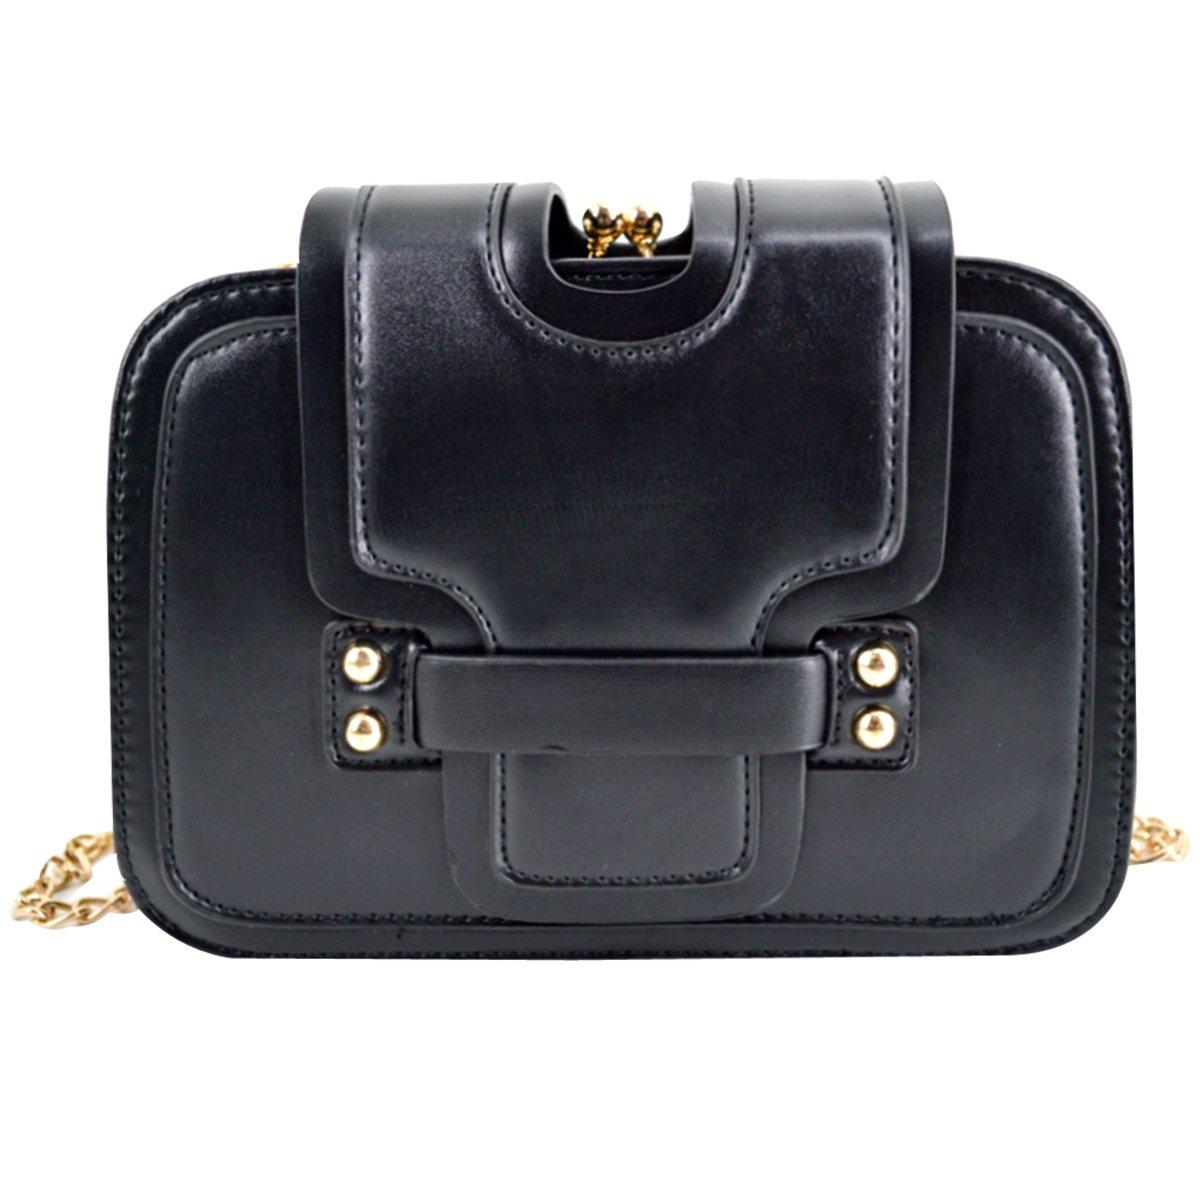 Rebecca PU Leather Chain Strap Shoulder Bag Ladies Handbag Evening Party Wedding Purse (Black)